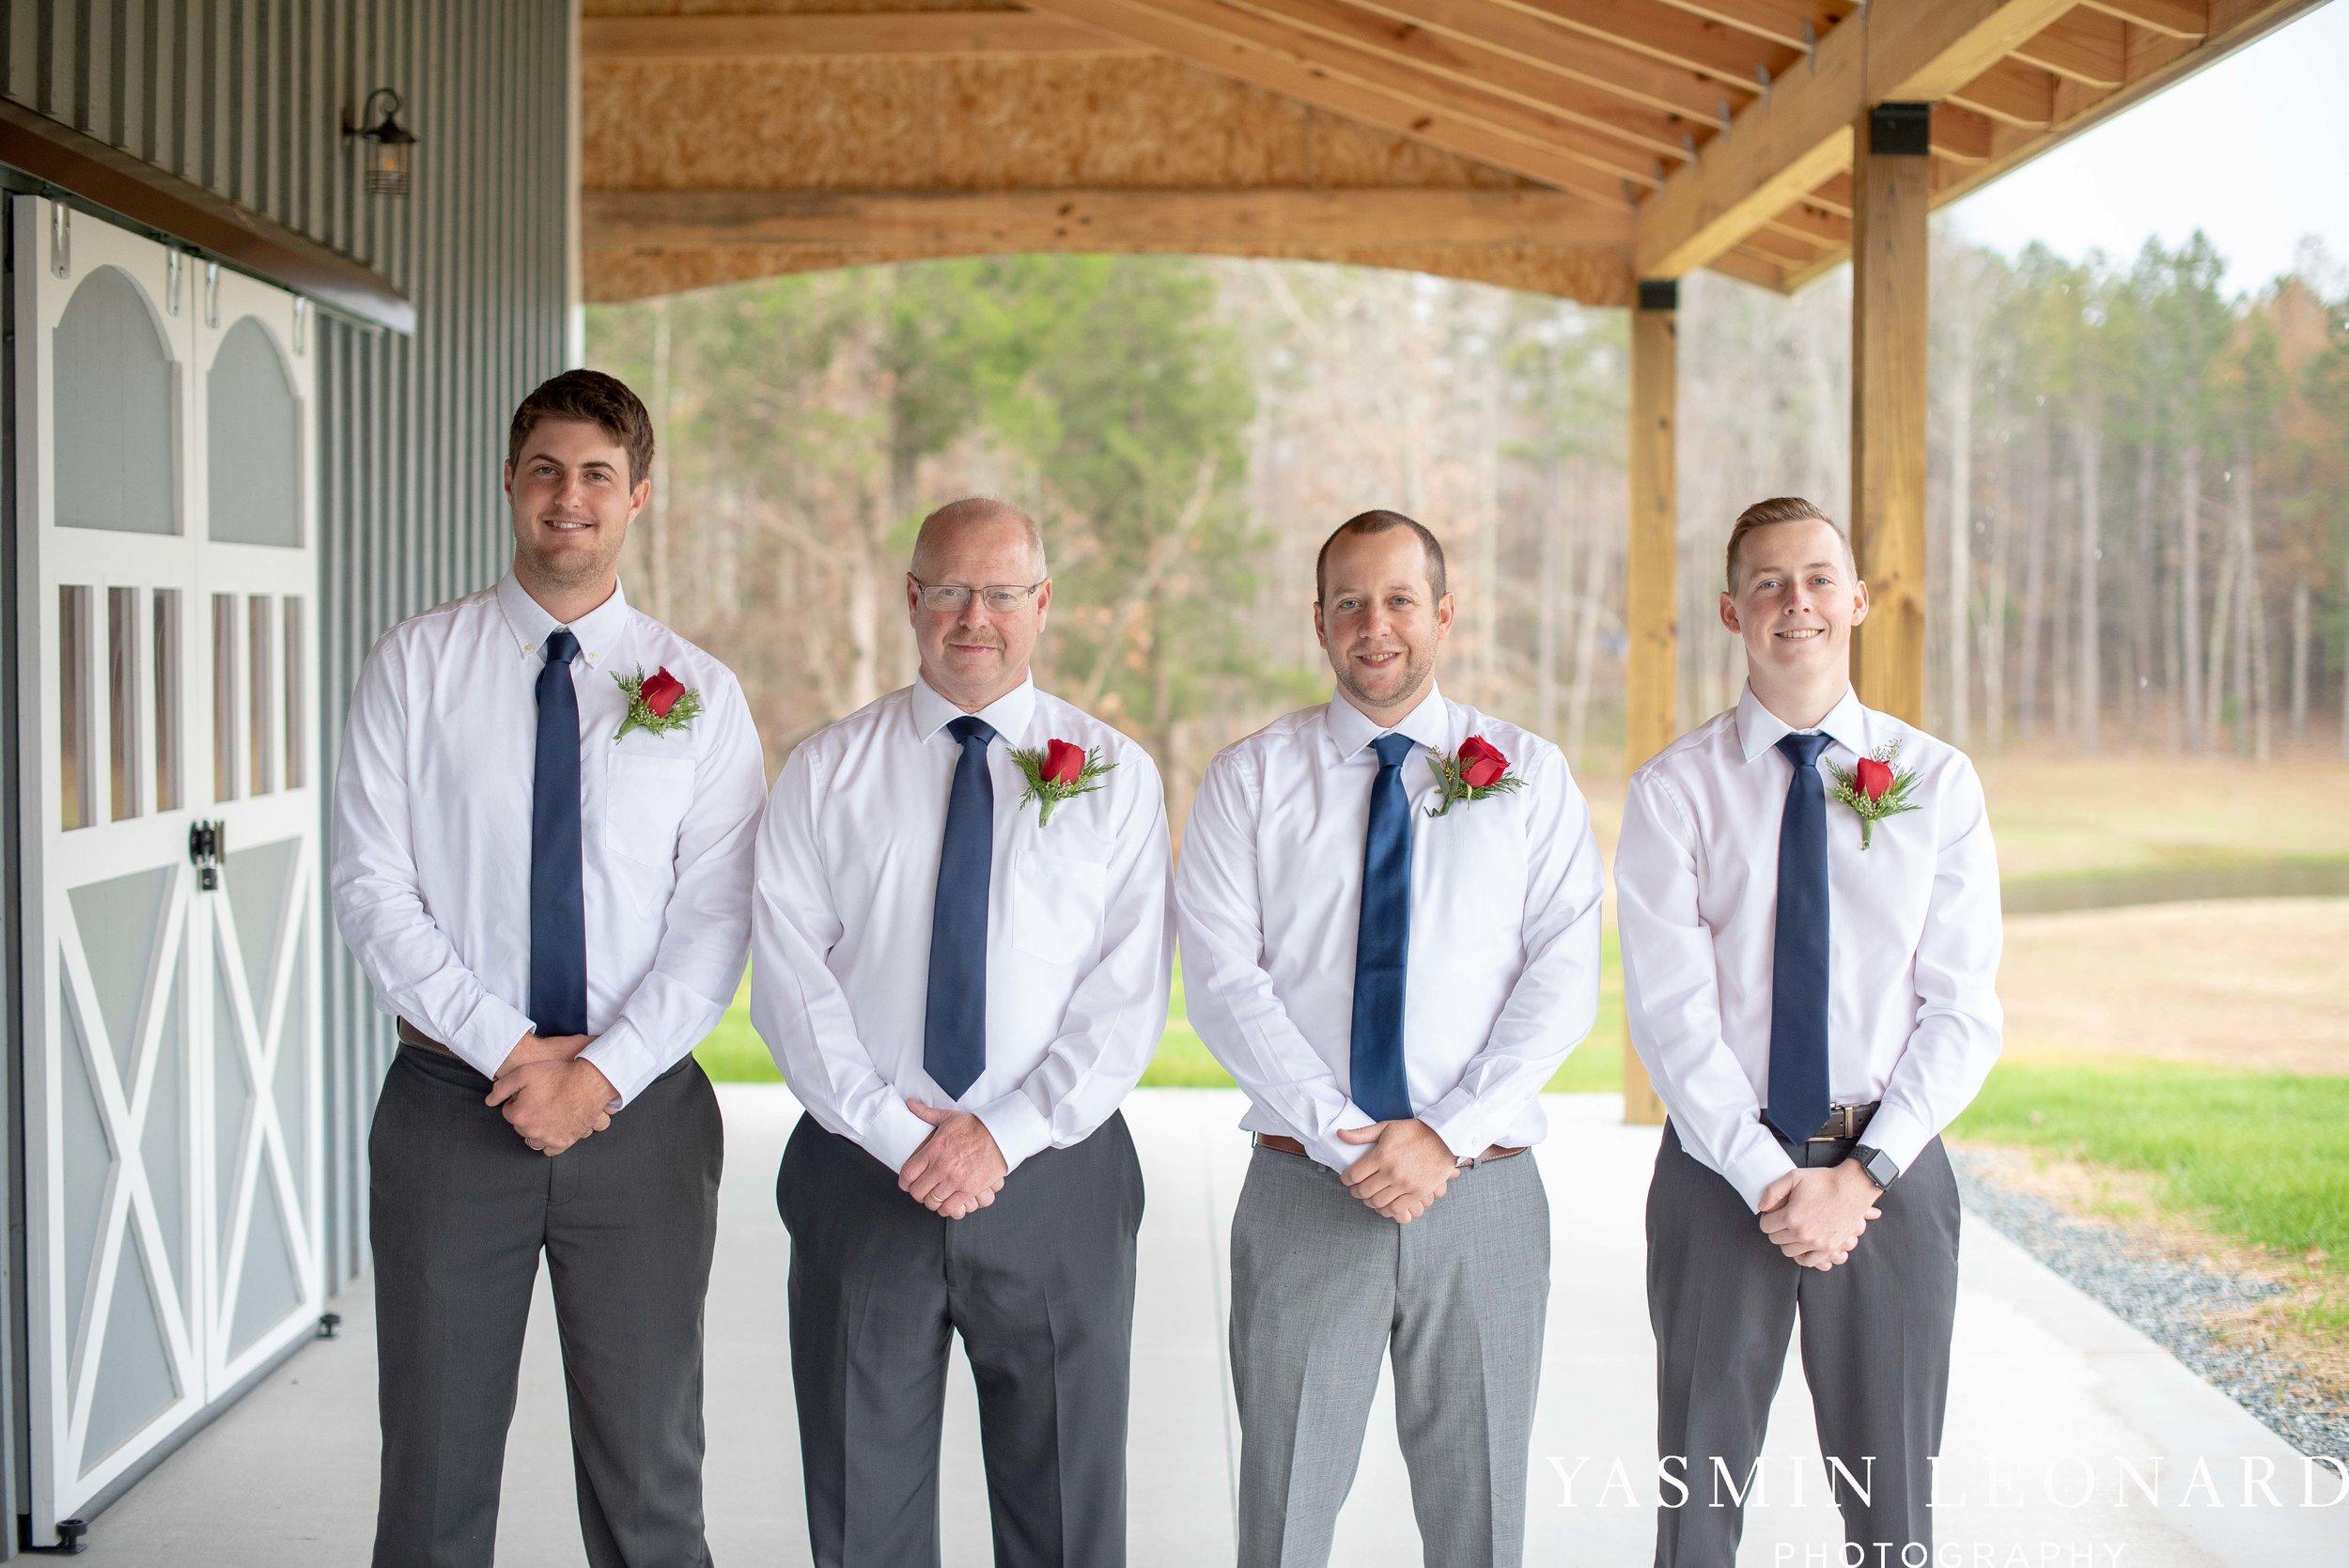 Secret Meadows at Green Dell Farm, NC Barns, NC Wedding Venues, Triad, NC, NC Wedding Photography, Triad Wedding Venues, Affordable Wedding Venues, NEW Wedding Venues, Christmas Weddings-14.jpg